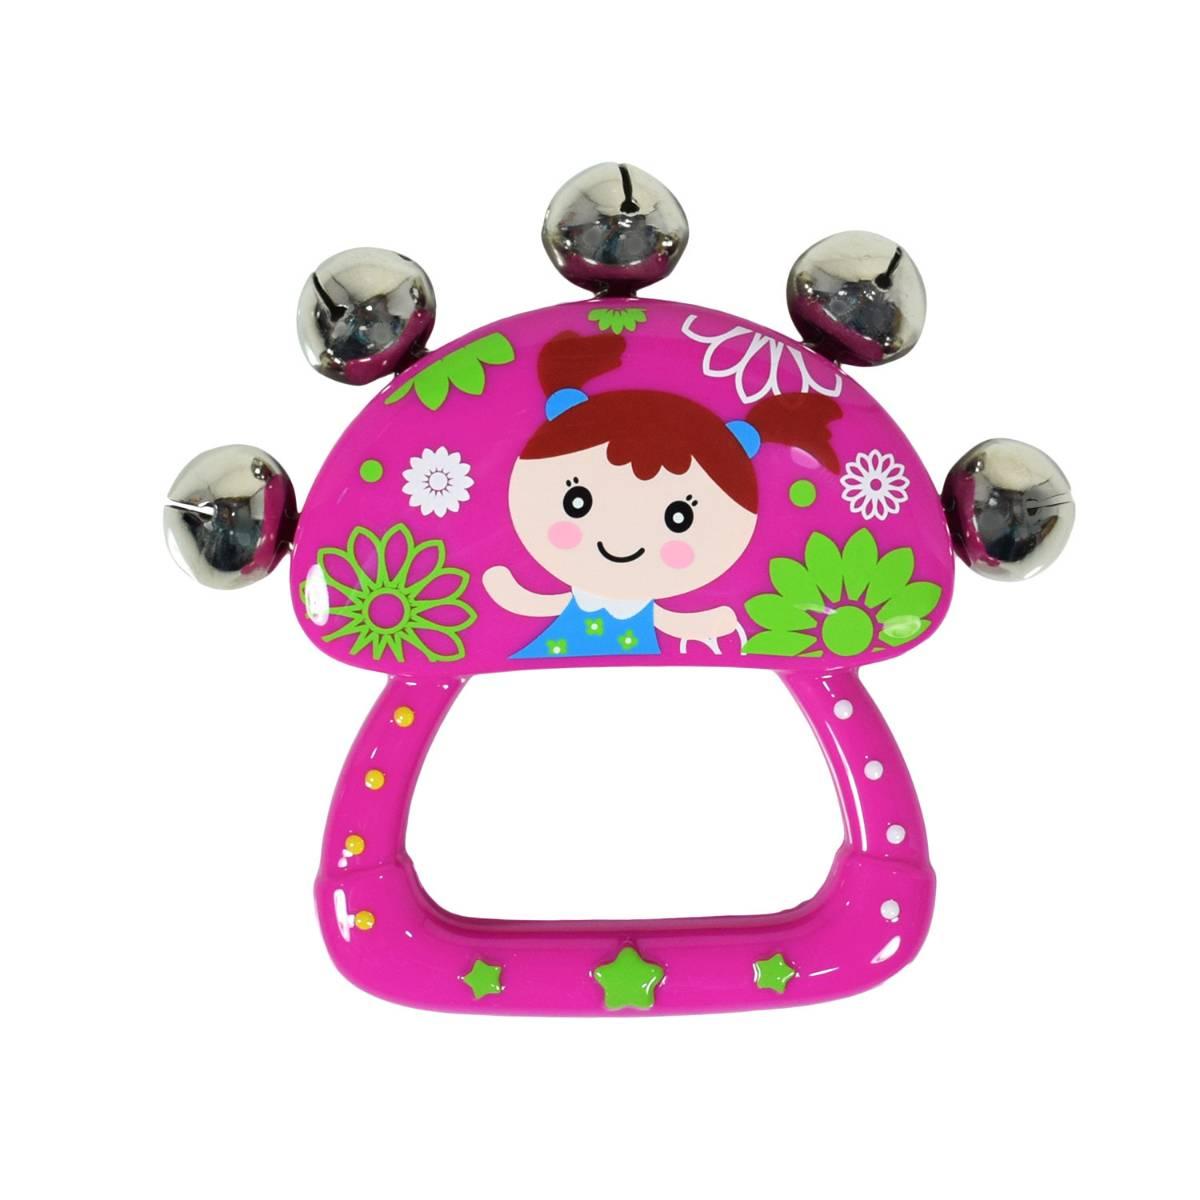 Mainan Bayi - Rattle Bell / Kerincingan Tangan1